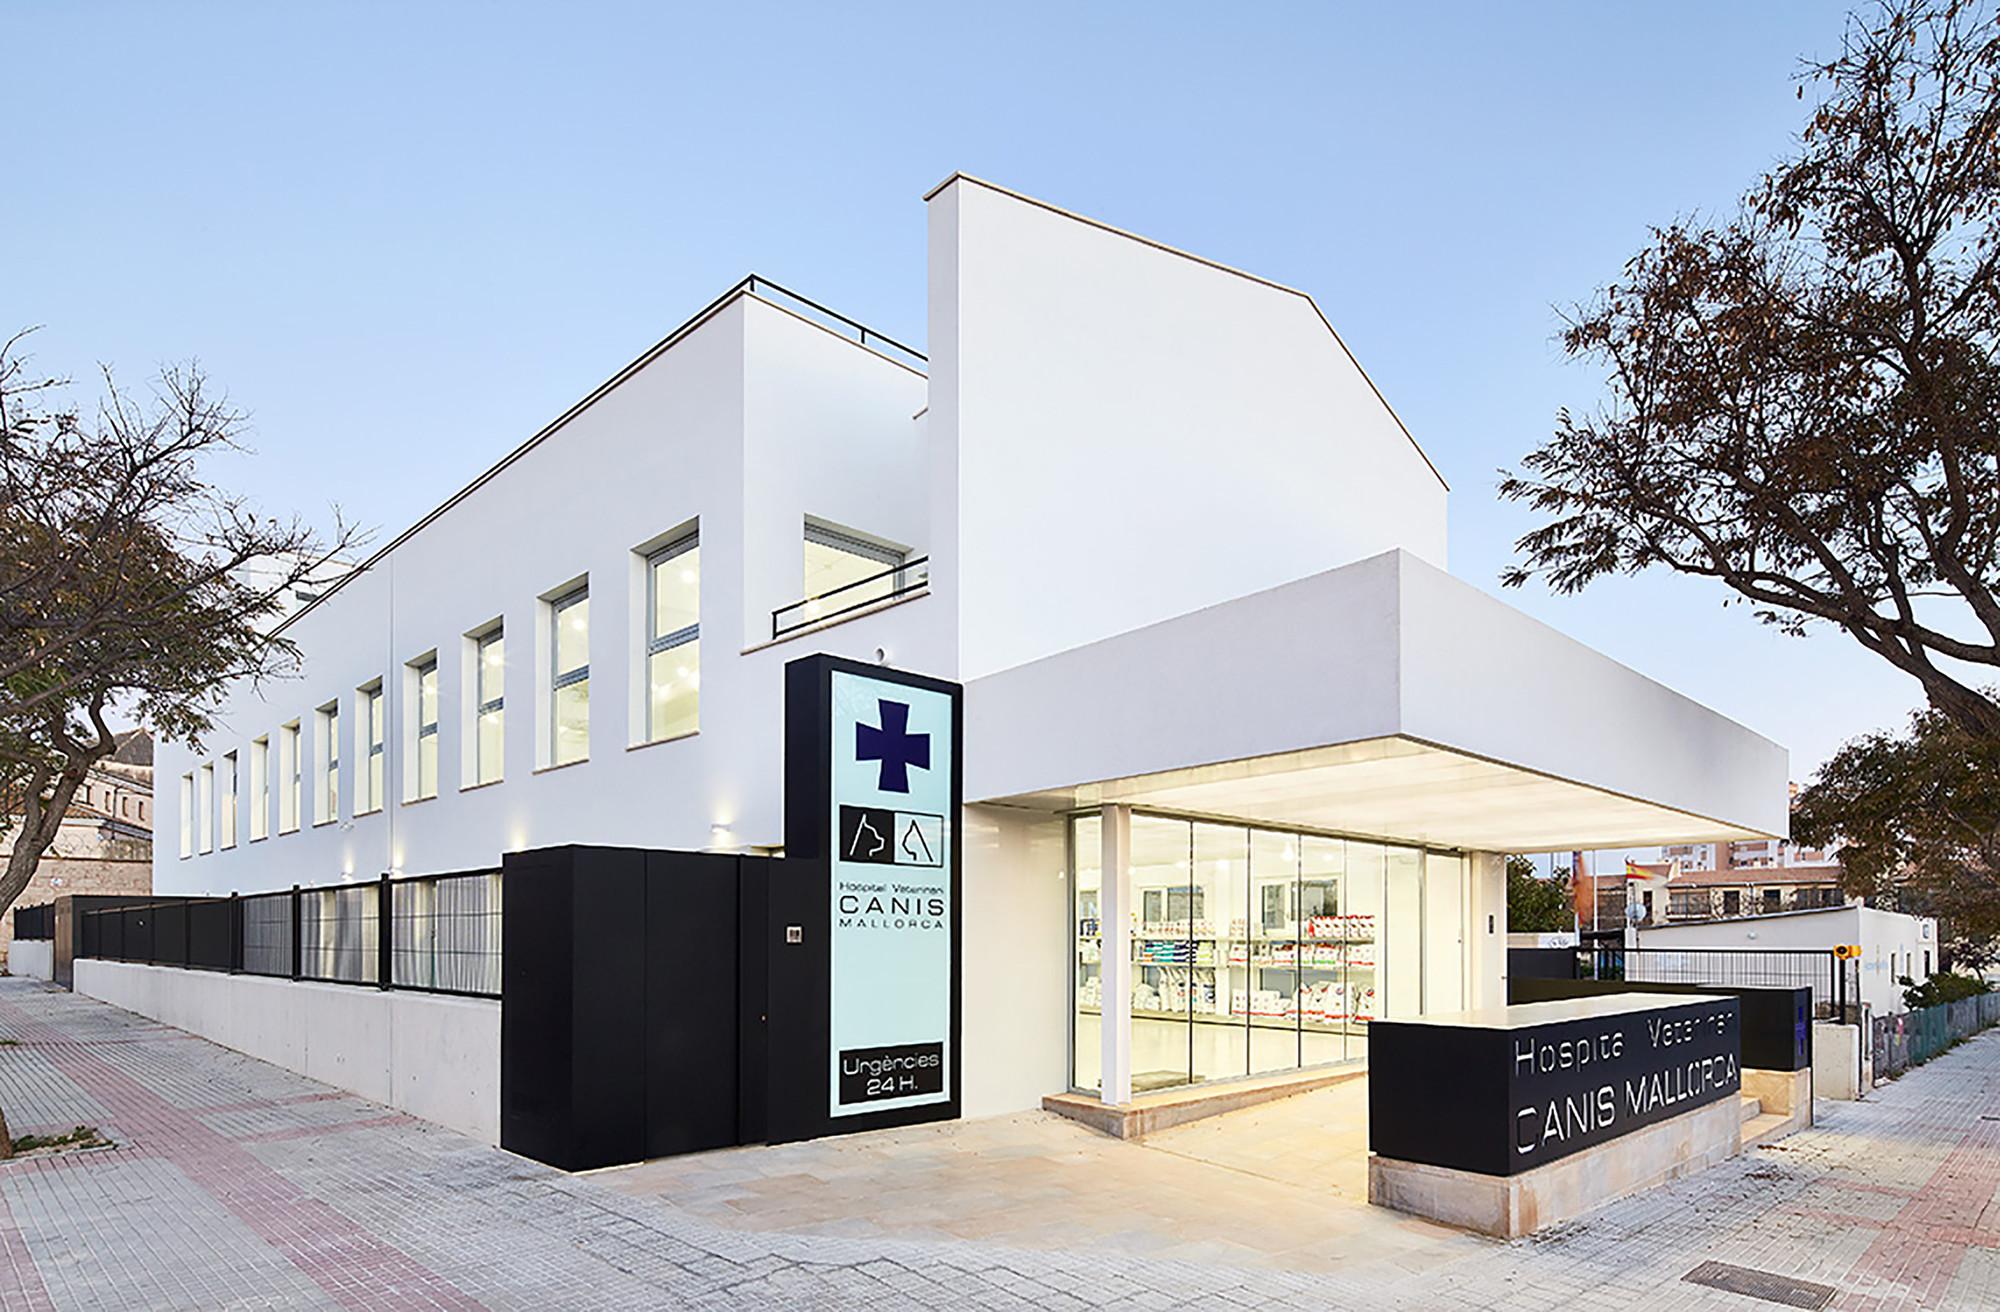 Hospital Veterinario Canis Mallorca  / Estudi E. Torres Pujol, © Jose Hevia